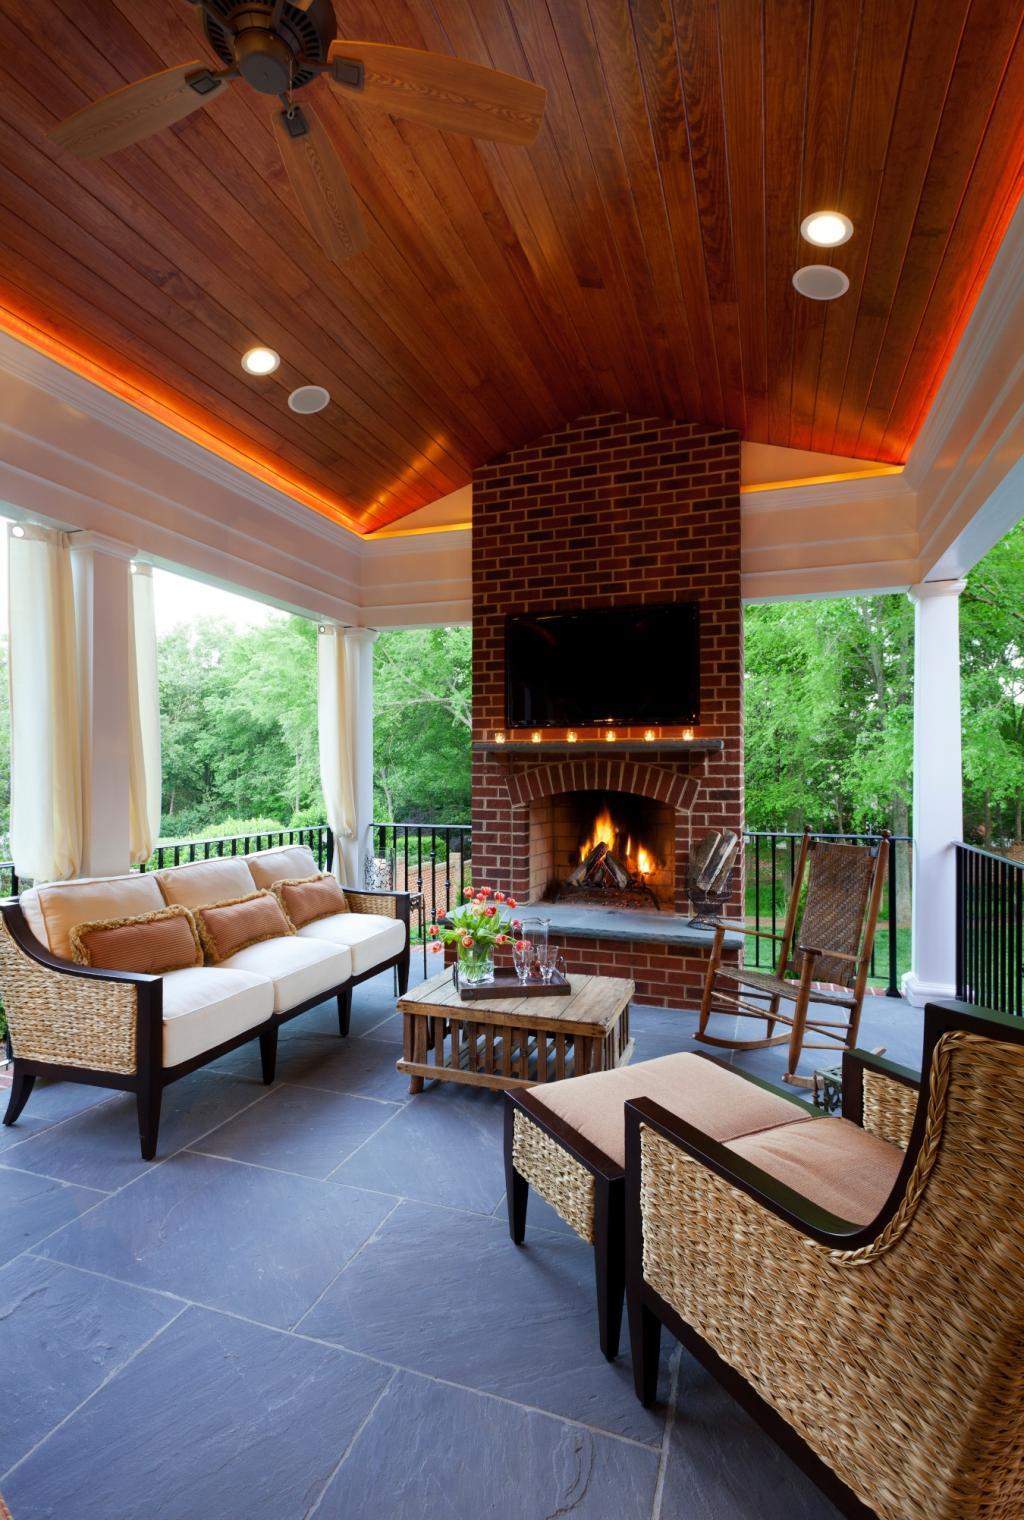 Shillington Outdoor Patio Renovation | Alair Homes Charlotte on Living Patio id=87956